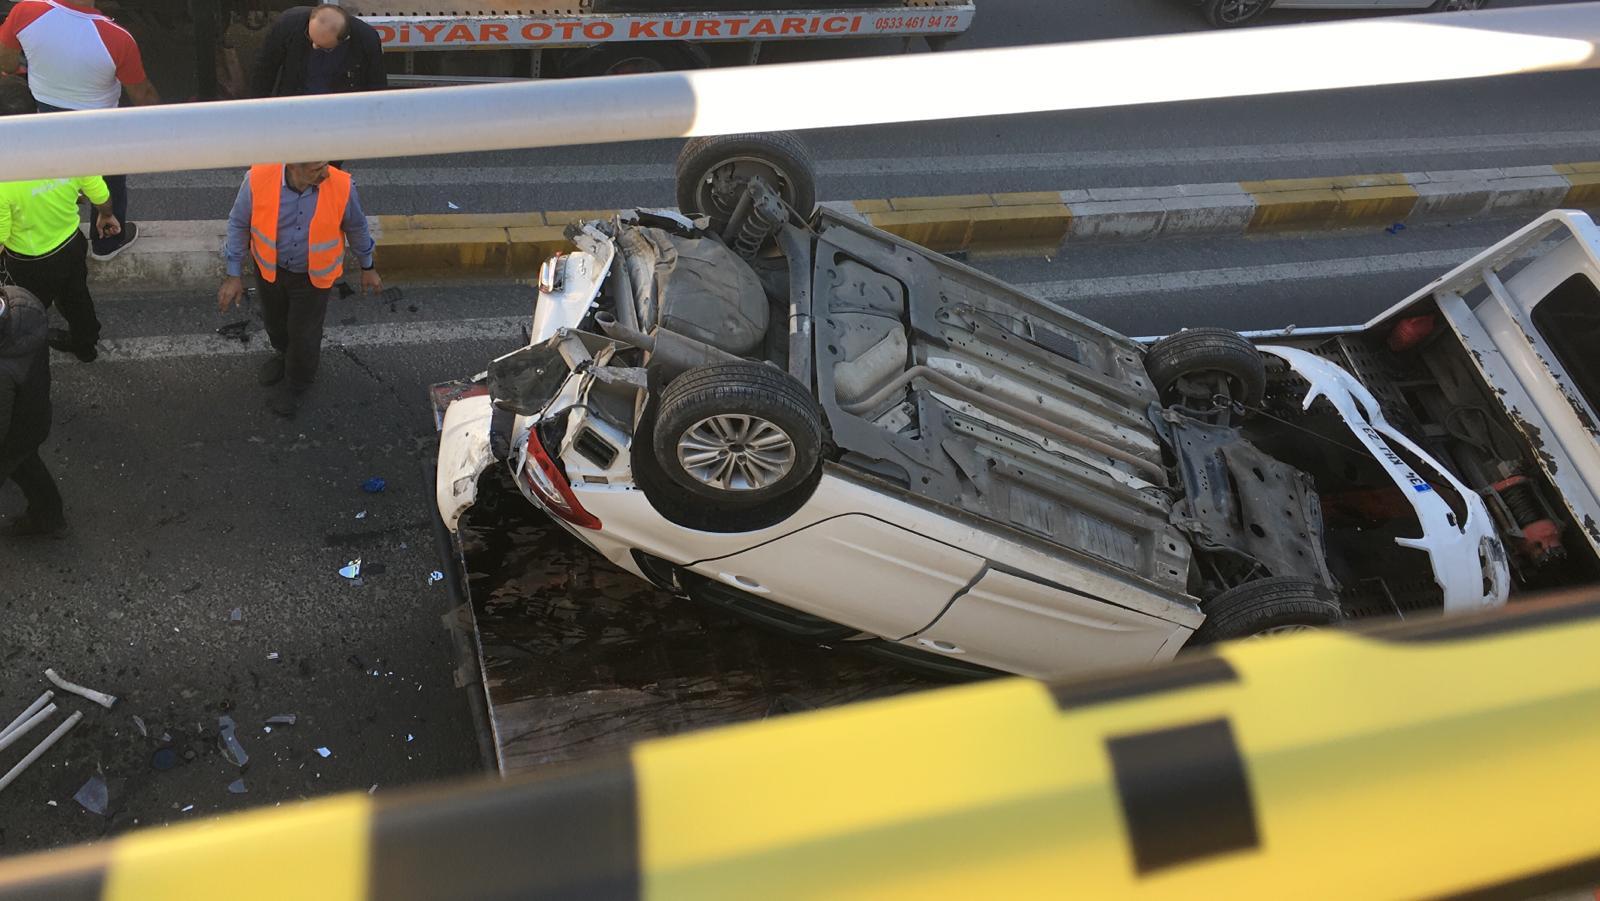 VİDEO - Diyarbakır'da feci kaza: 3 kişi ağır yaralandı